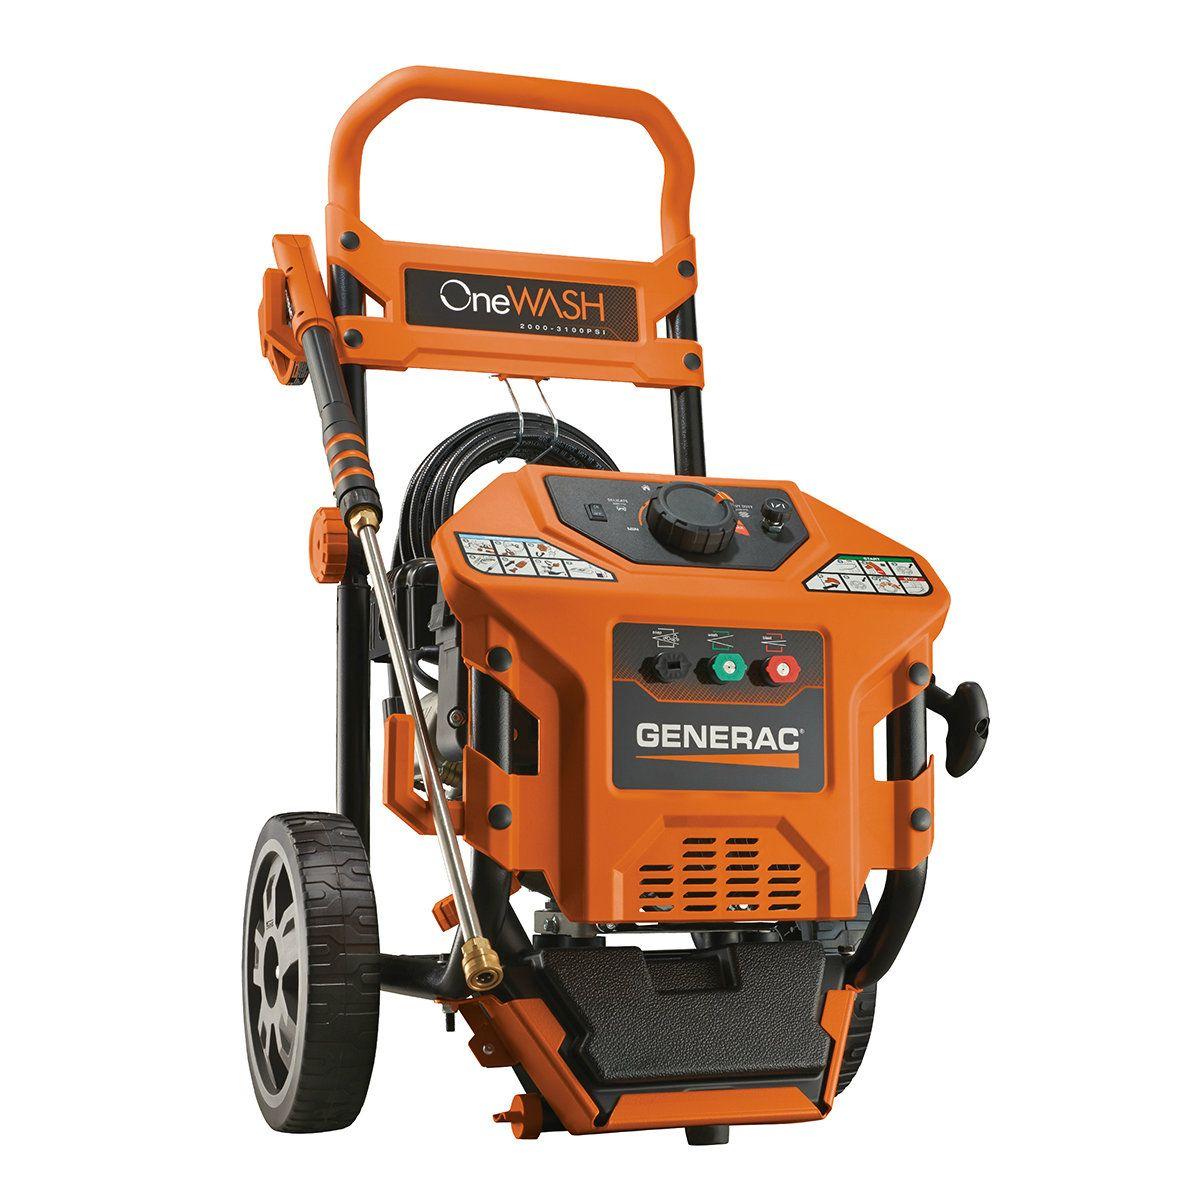 Generac 6602 Residential 3100PSI One Wash Best pressure